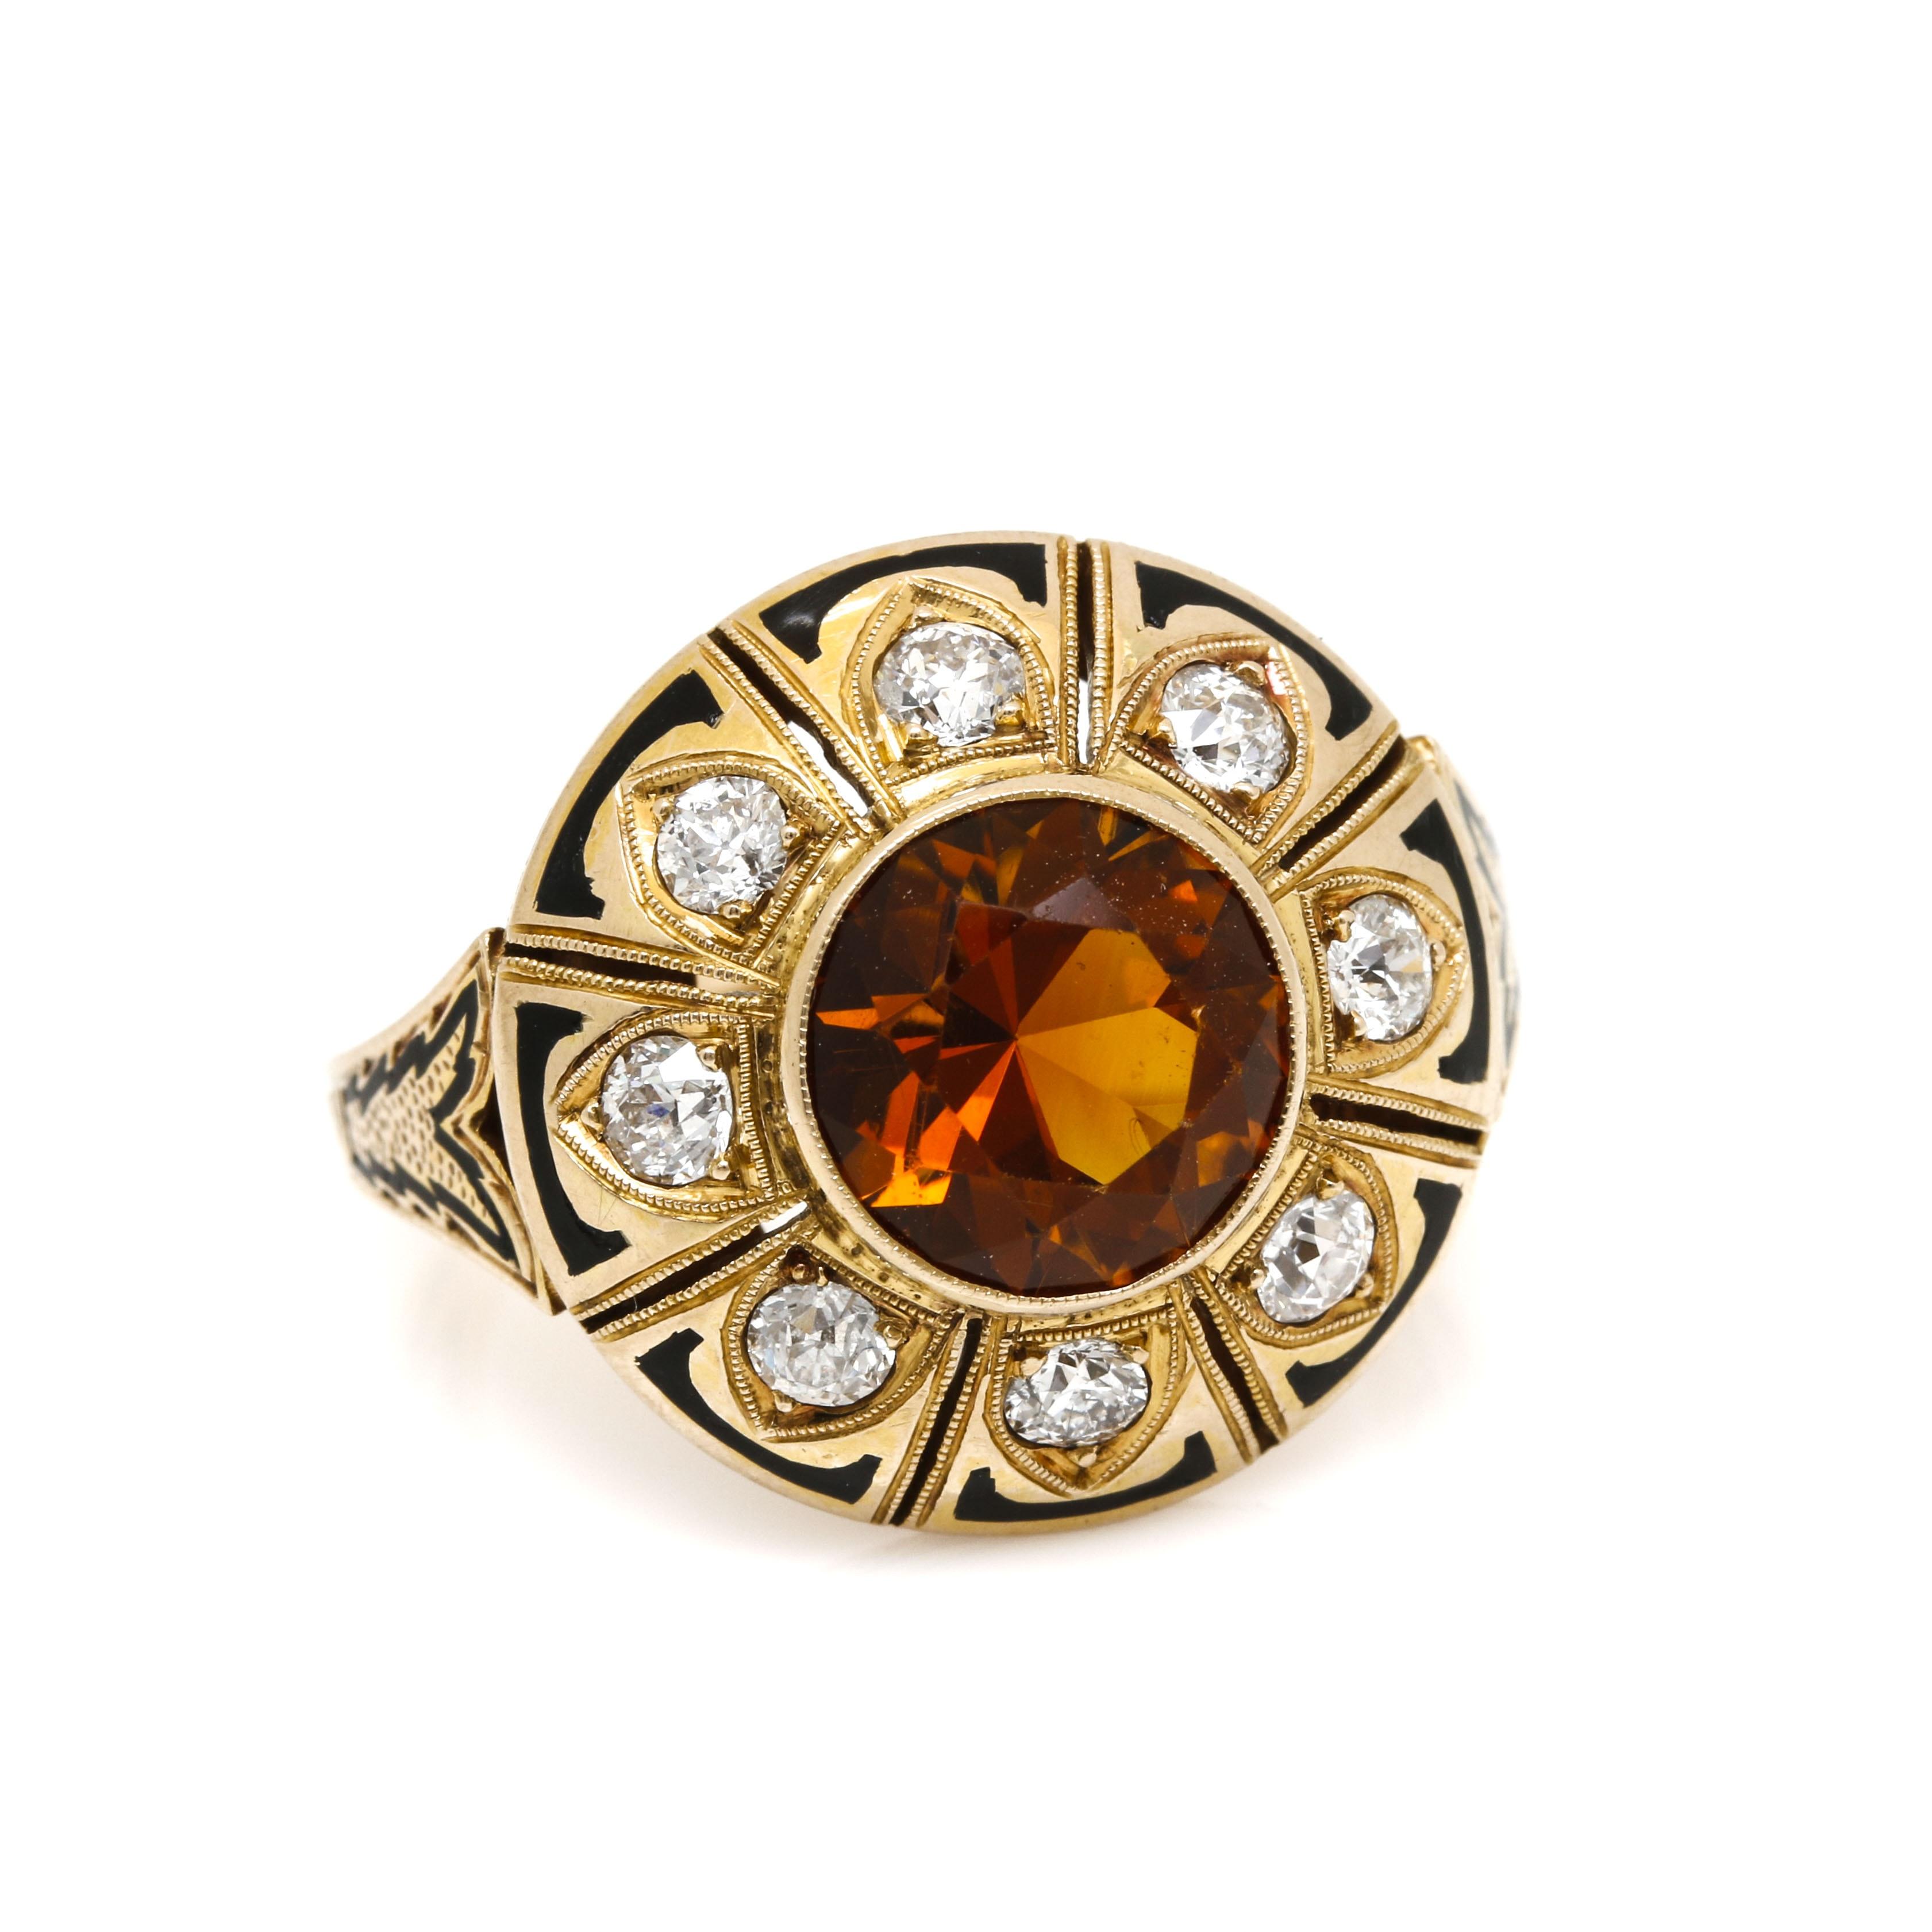 14K Yellow Gold Citrine, Diamond, and Enamel Ring